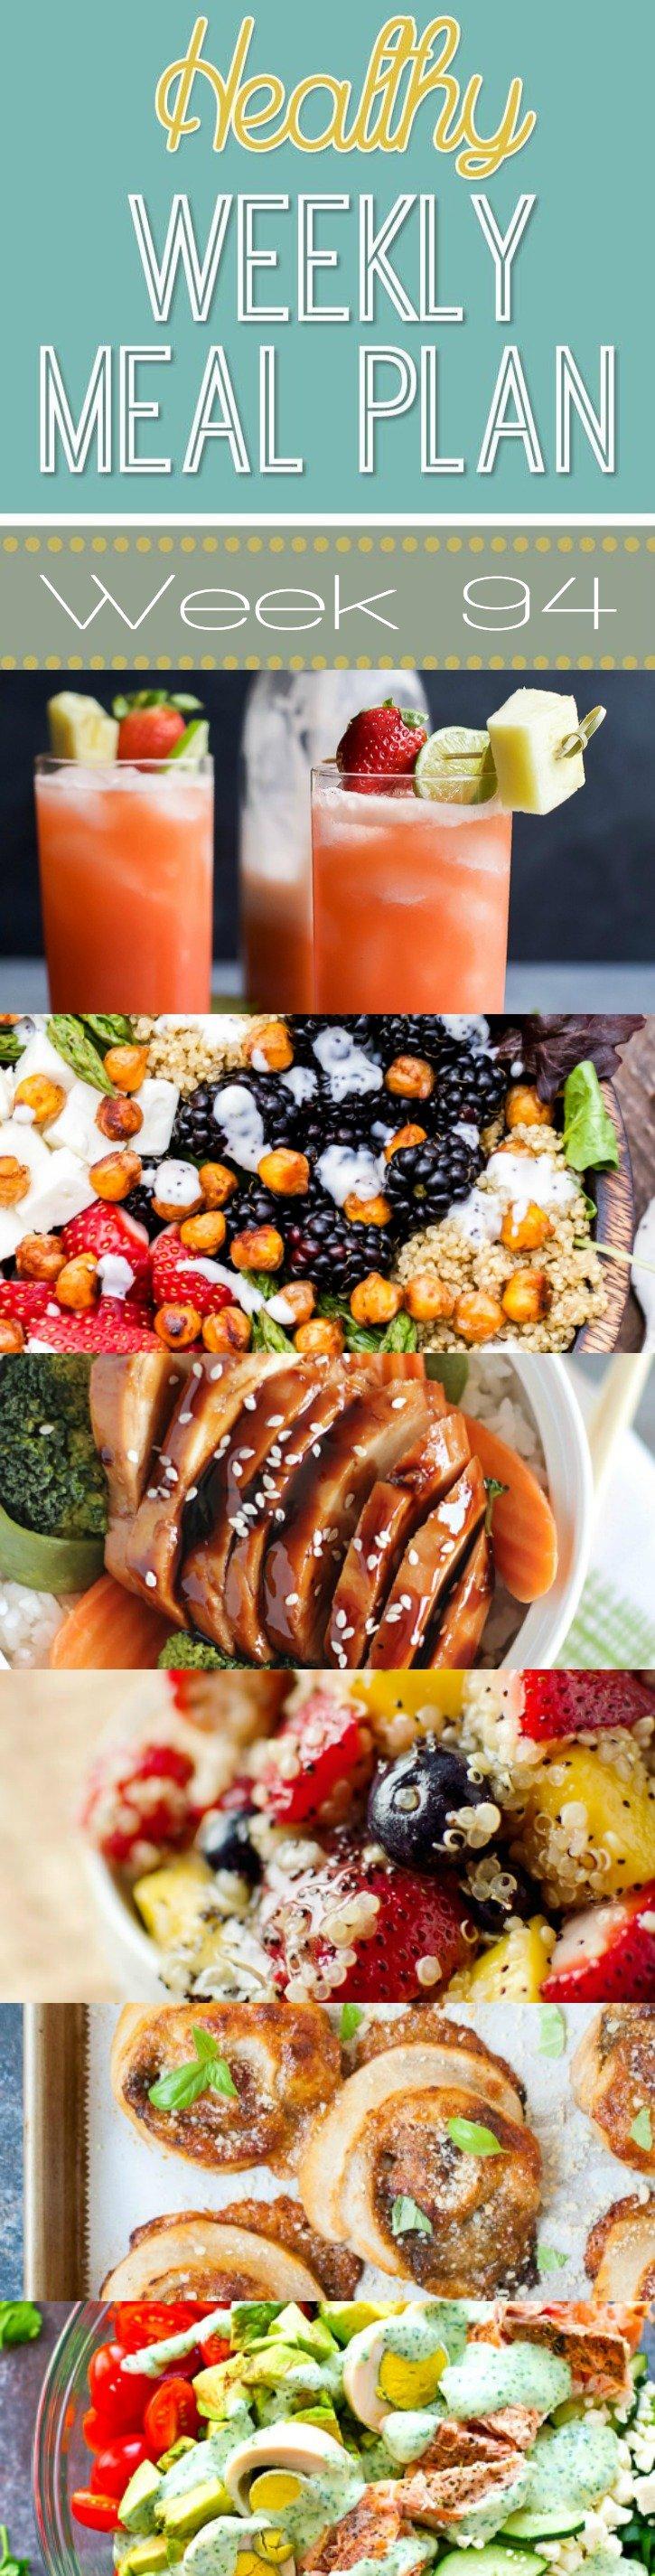 Healthy Weekly Meal Plan #94